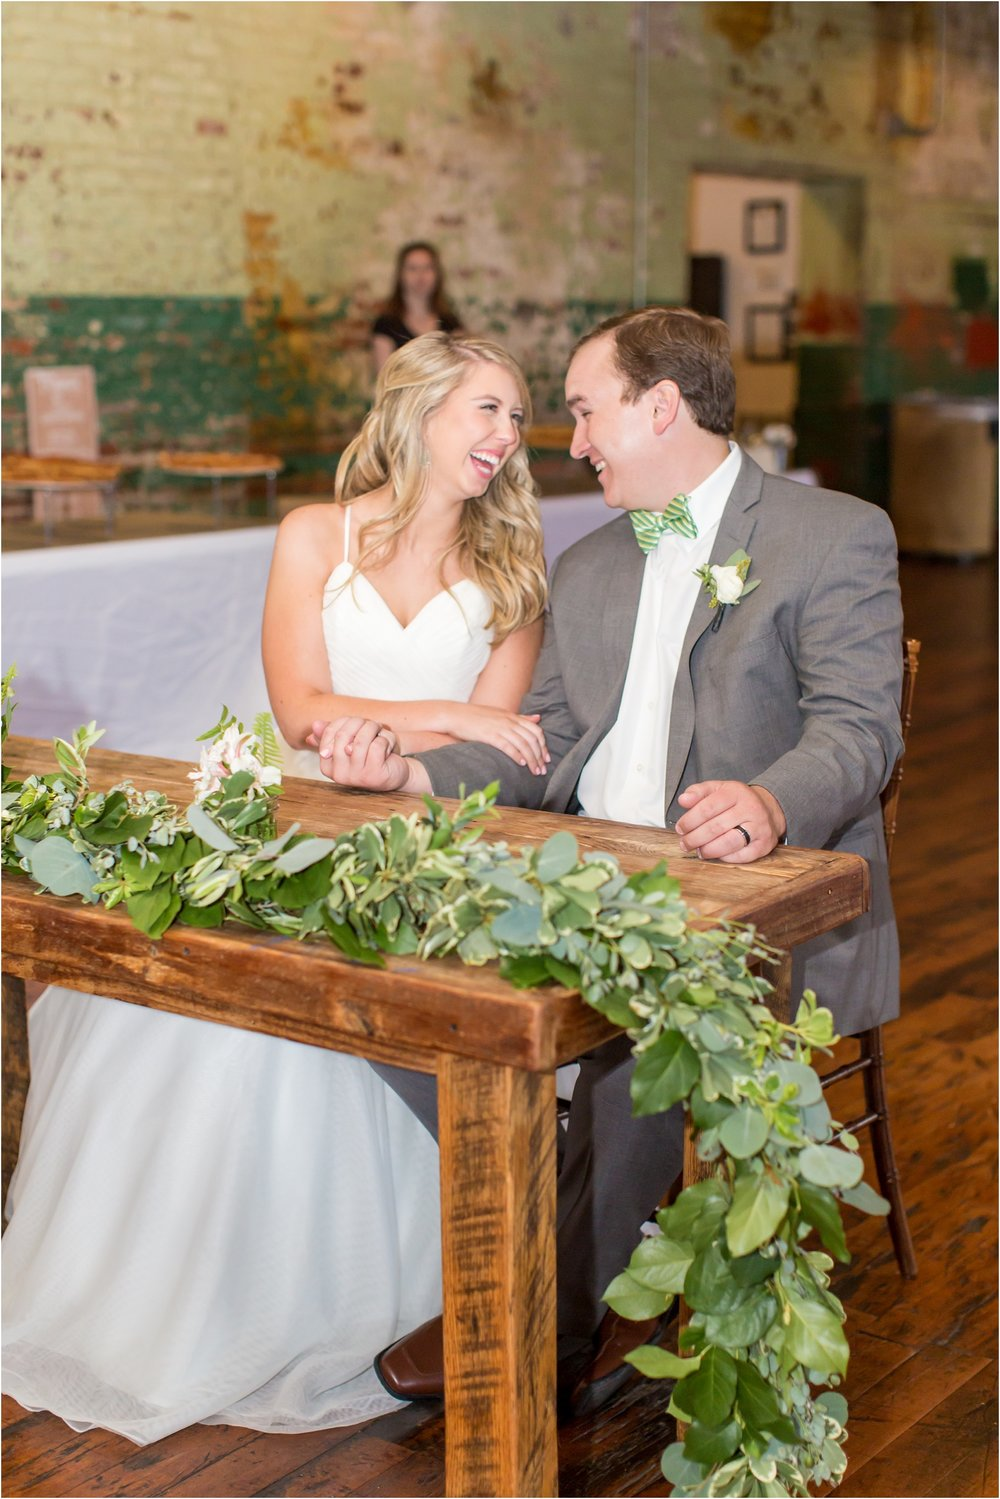 Savannah Eve Photography- Gunter Wedding- Blog-63.jpg